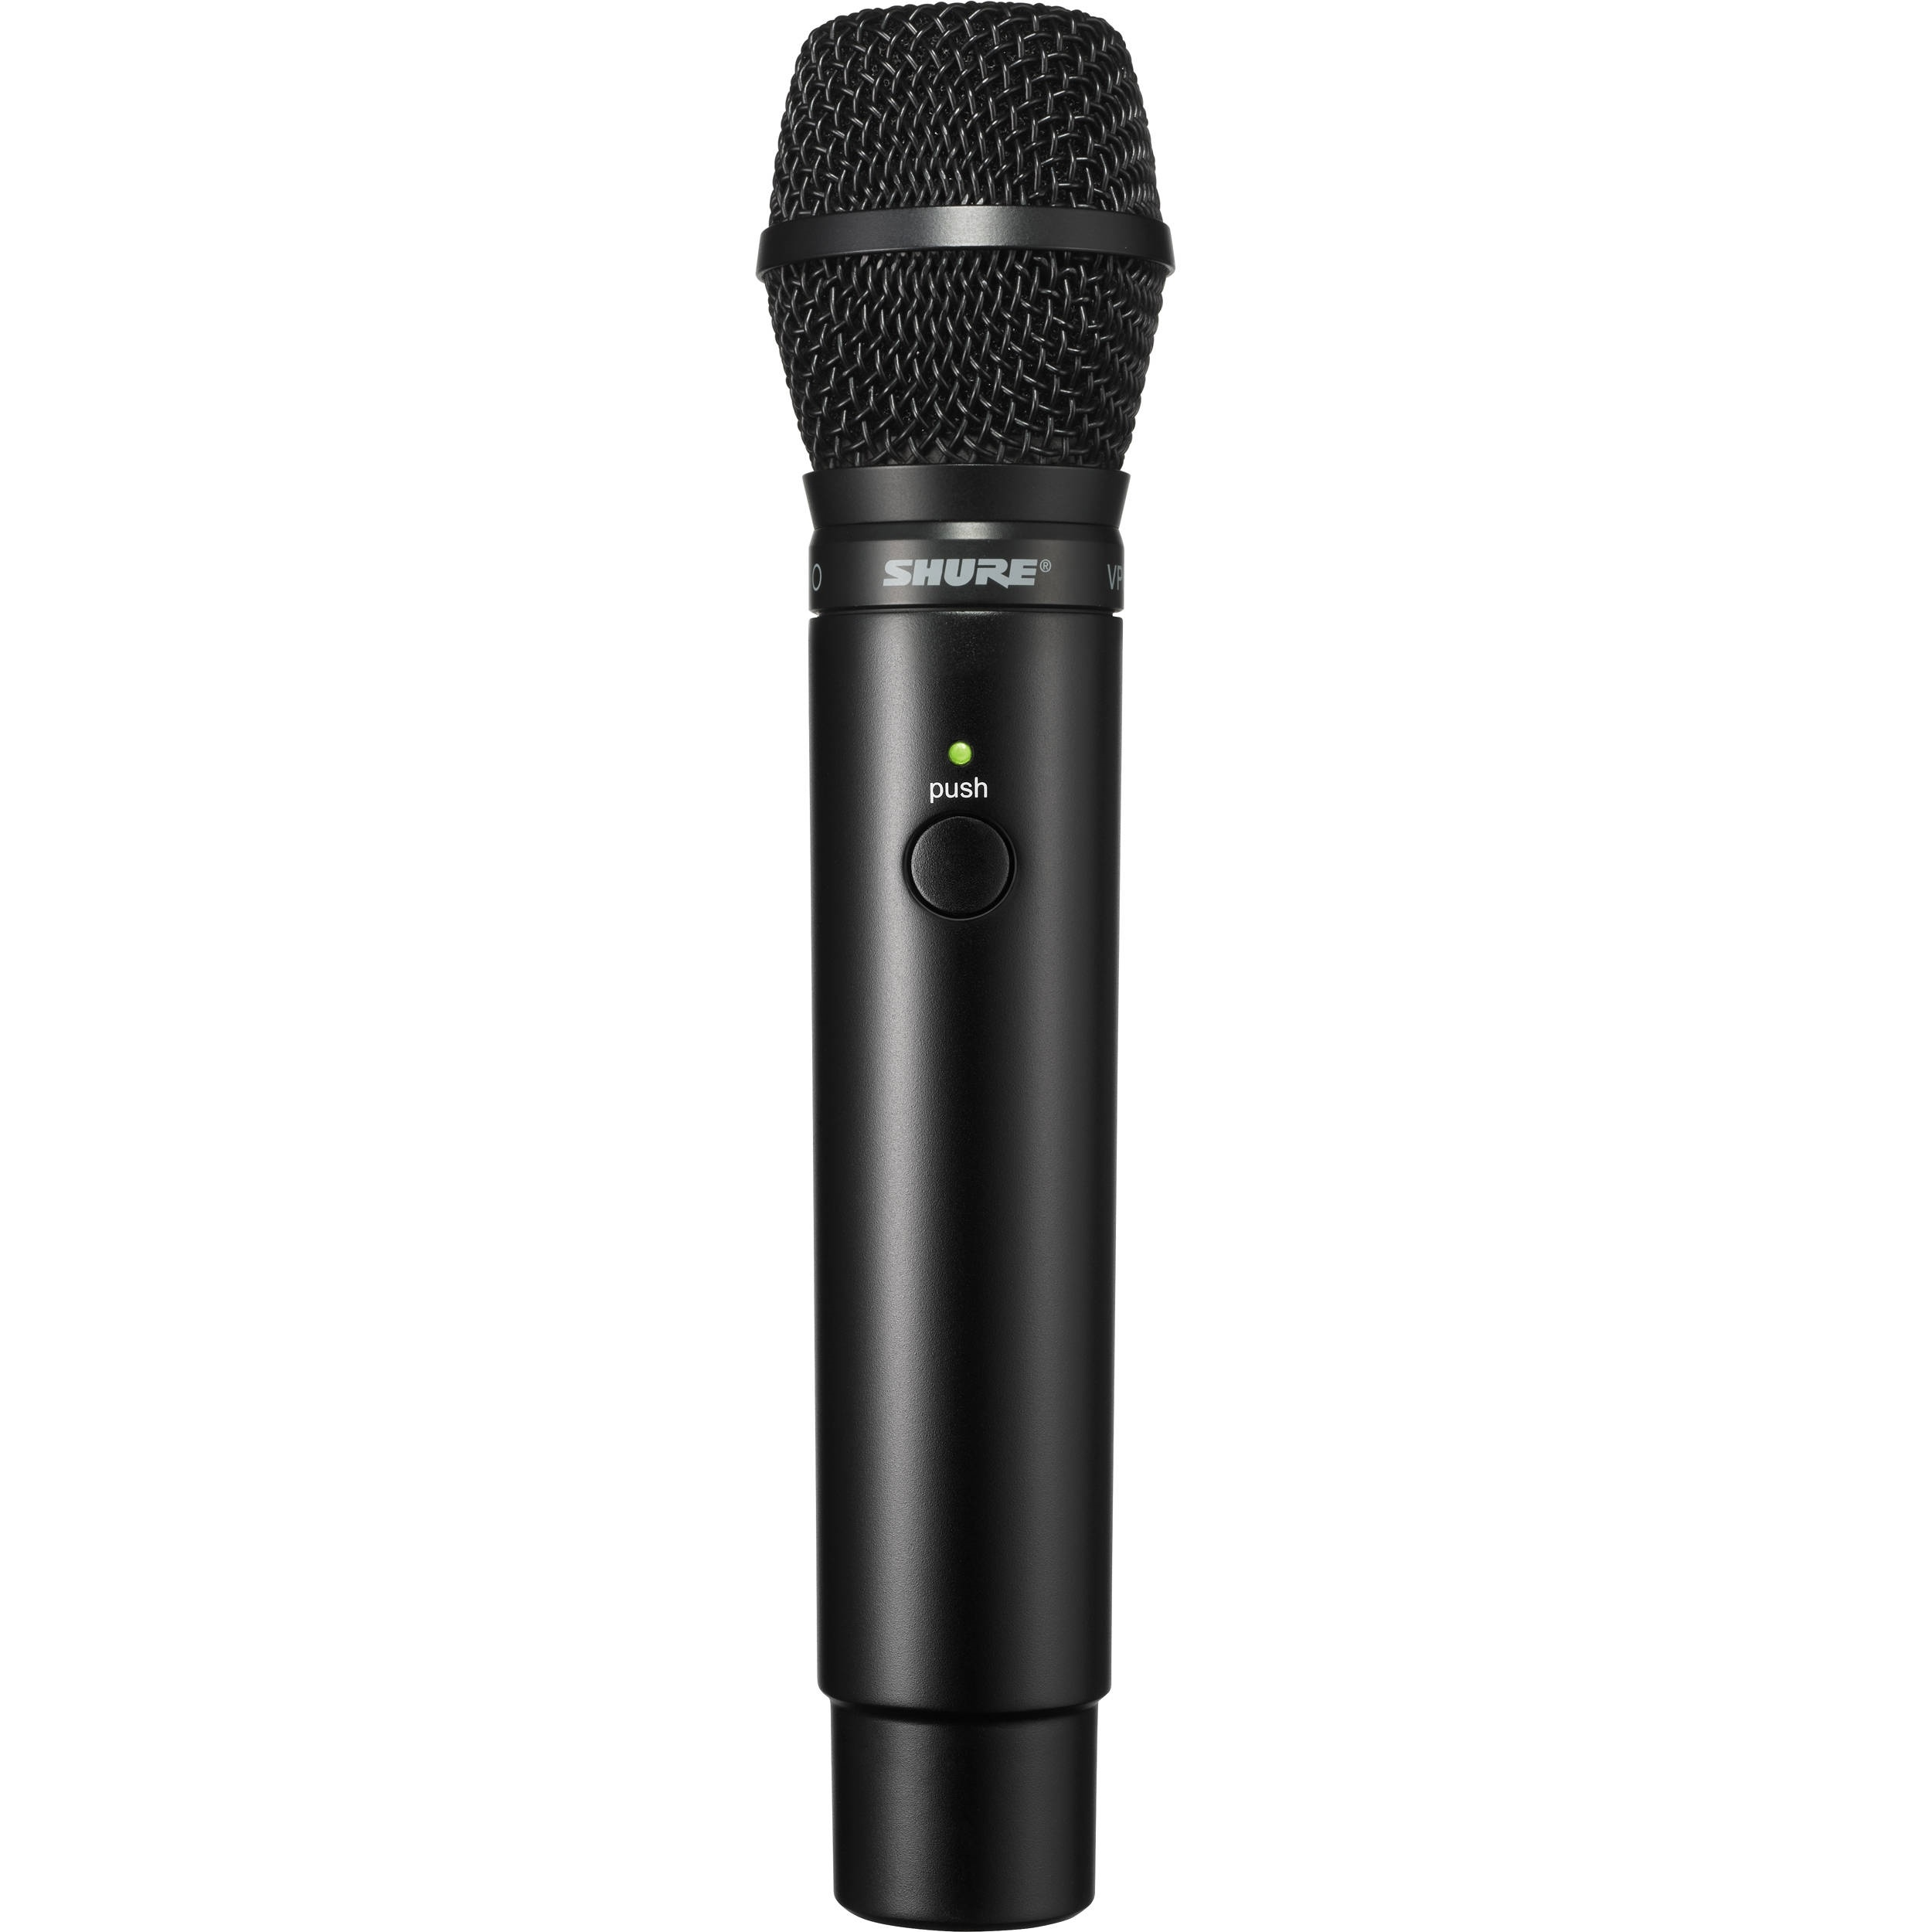 Shure MXW2 Handheld Transmitter with VP68 Microphone Capsule